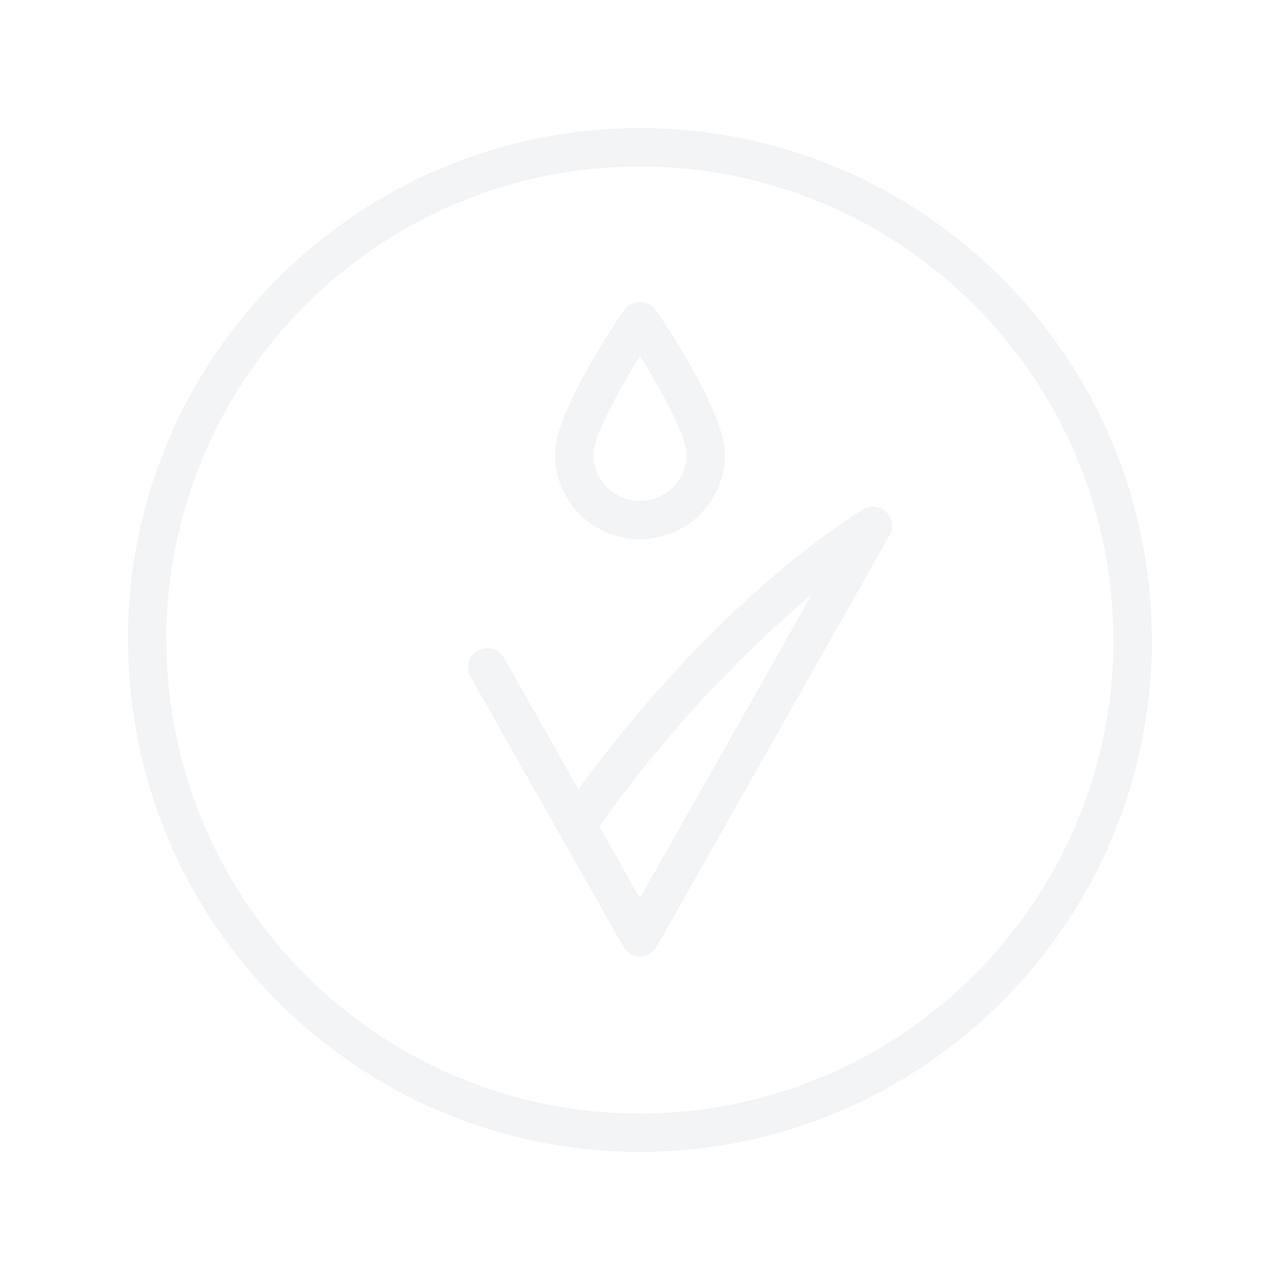 ARTDECO Camouflage Cream 4.5g